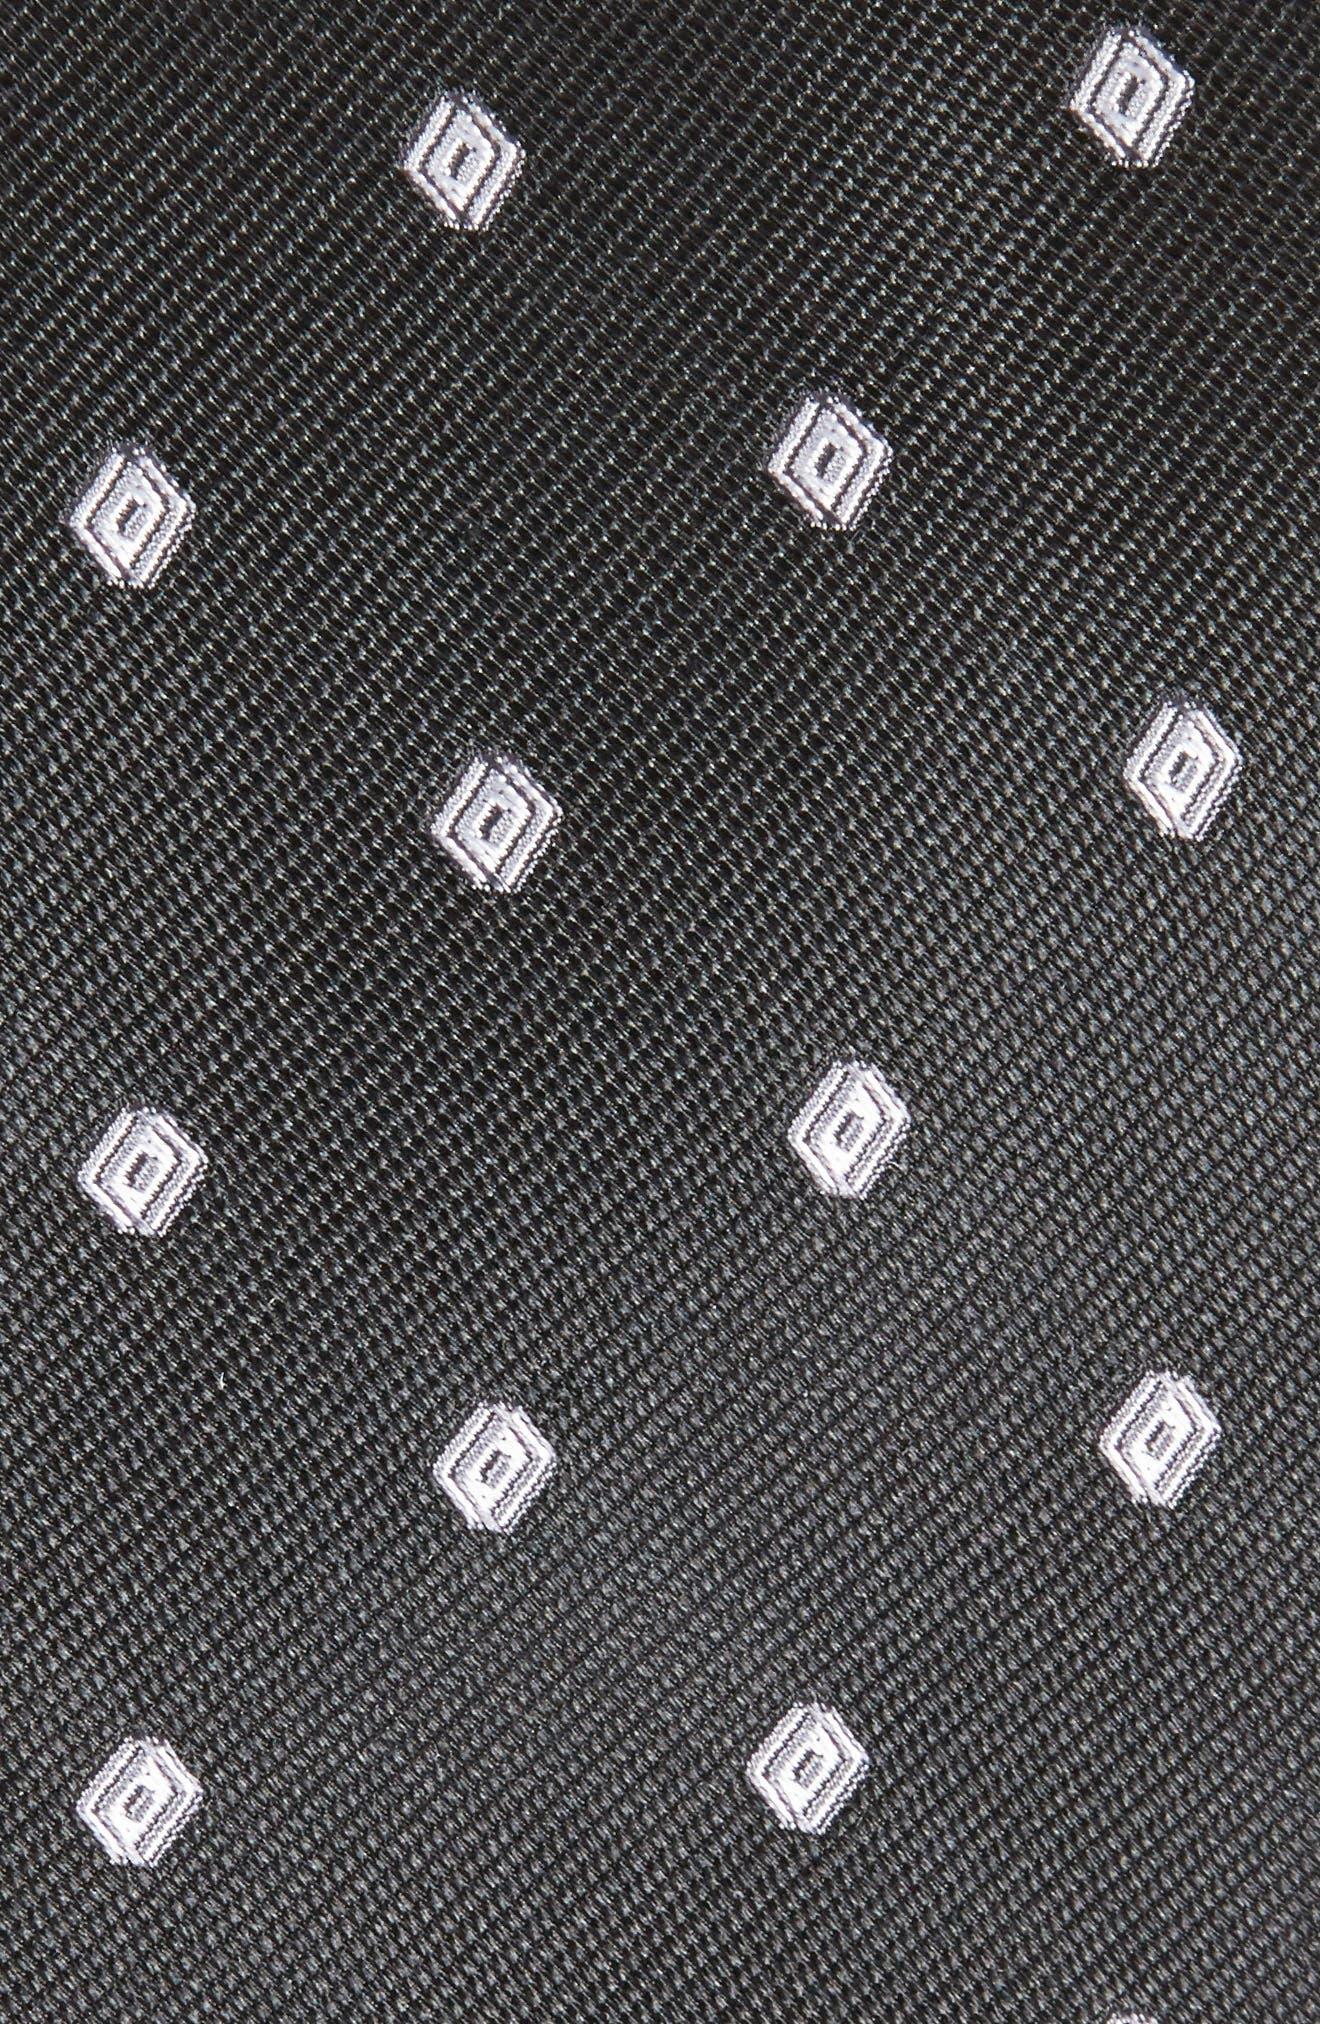 Alternate Image 2  - Calibrate Kaleri Neat Diamond Grid Silk Tie